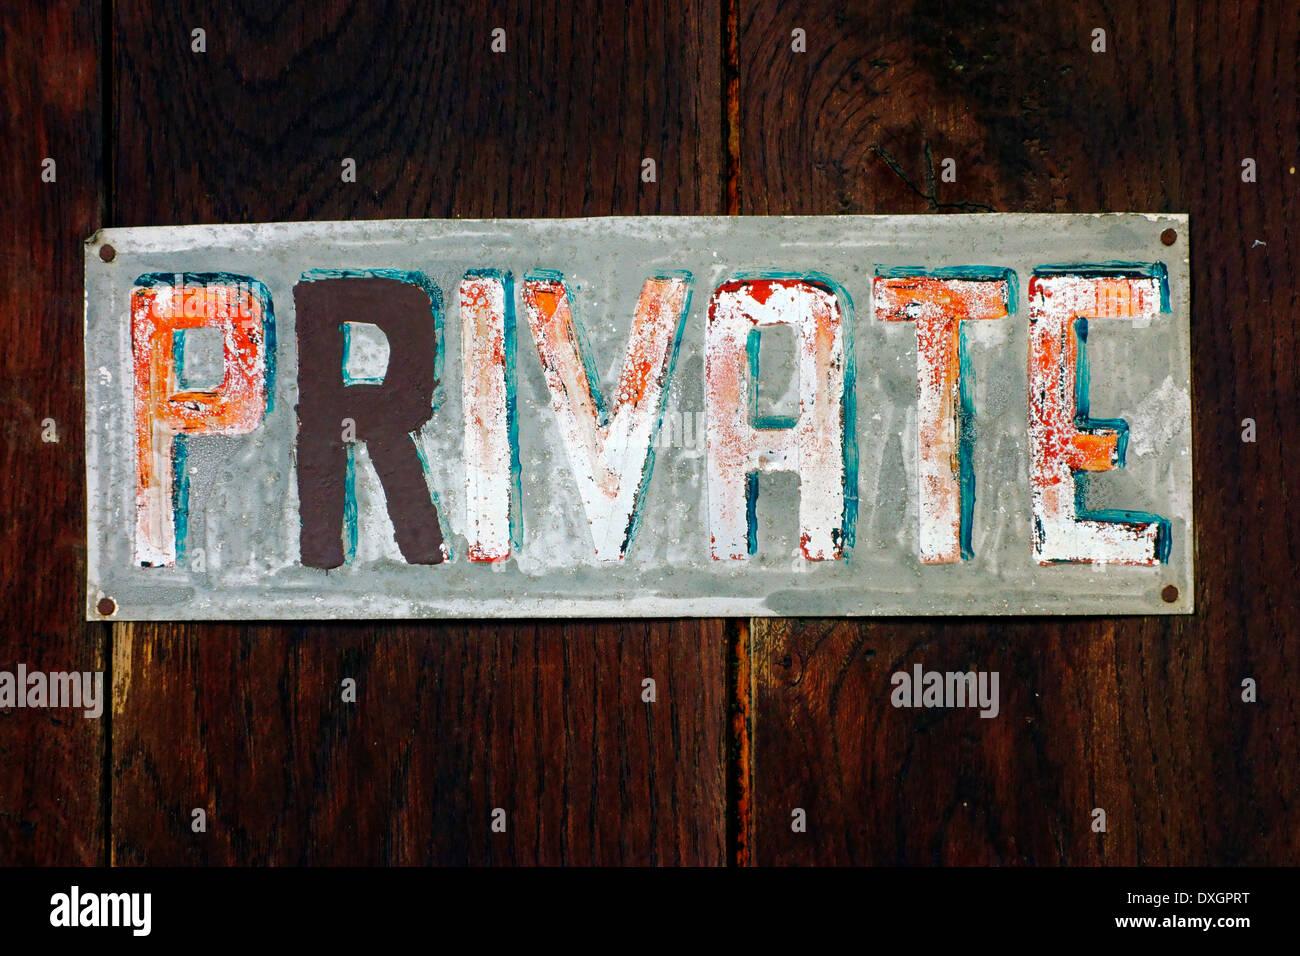 Private - Stock Image